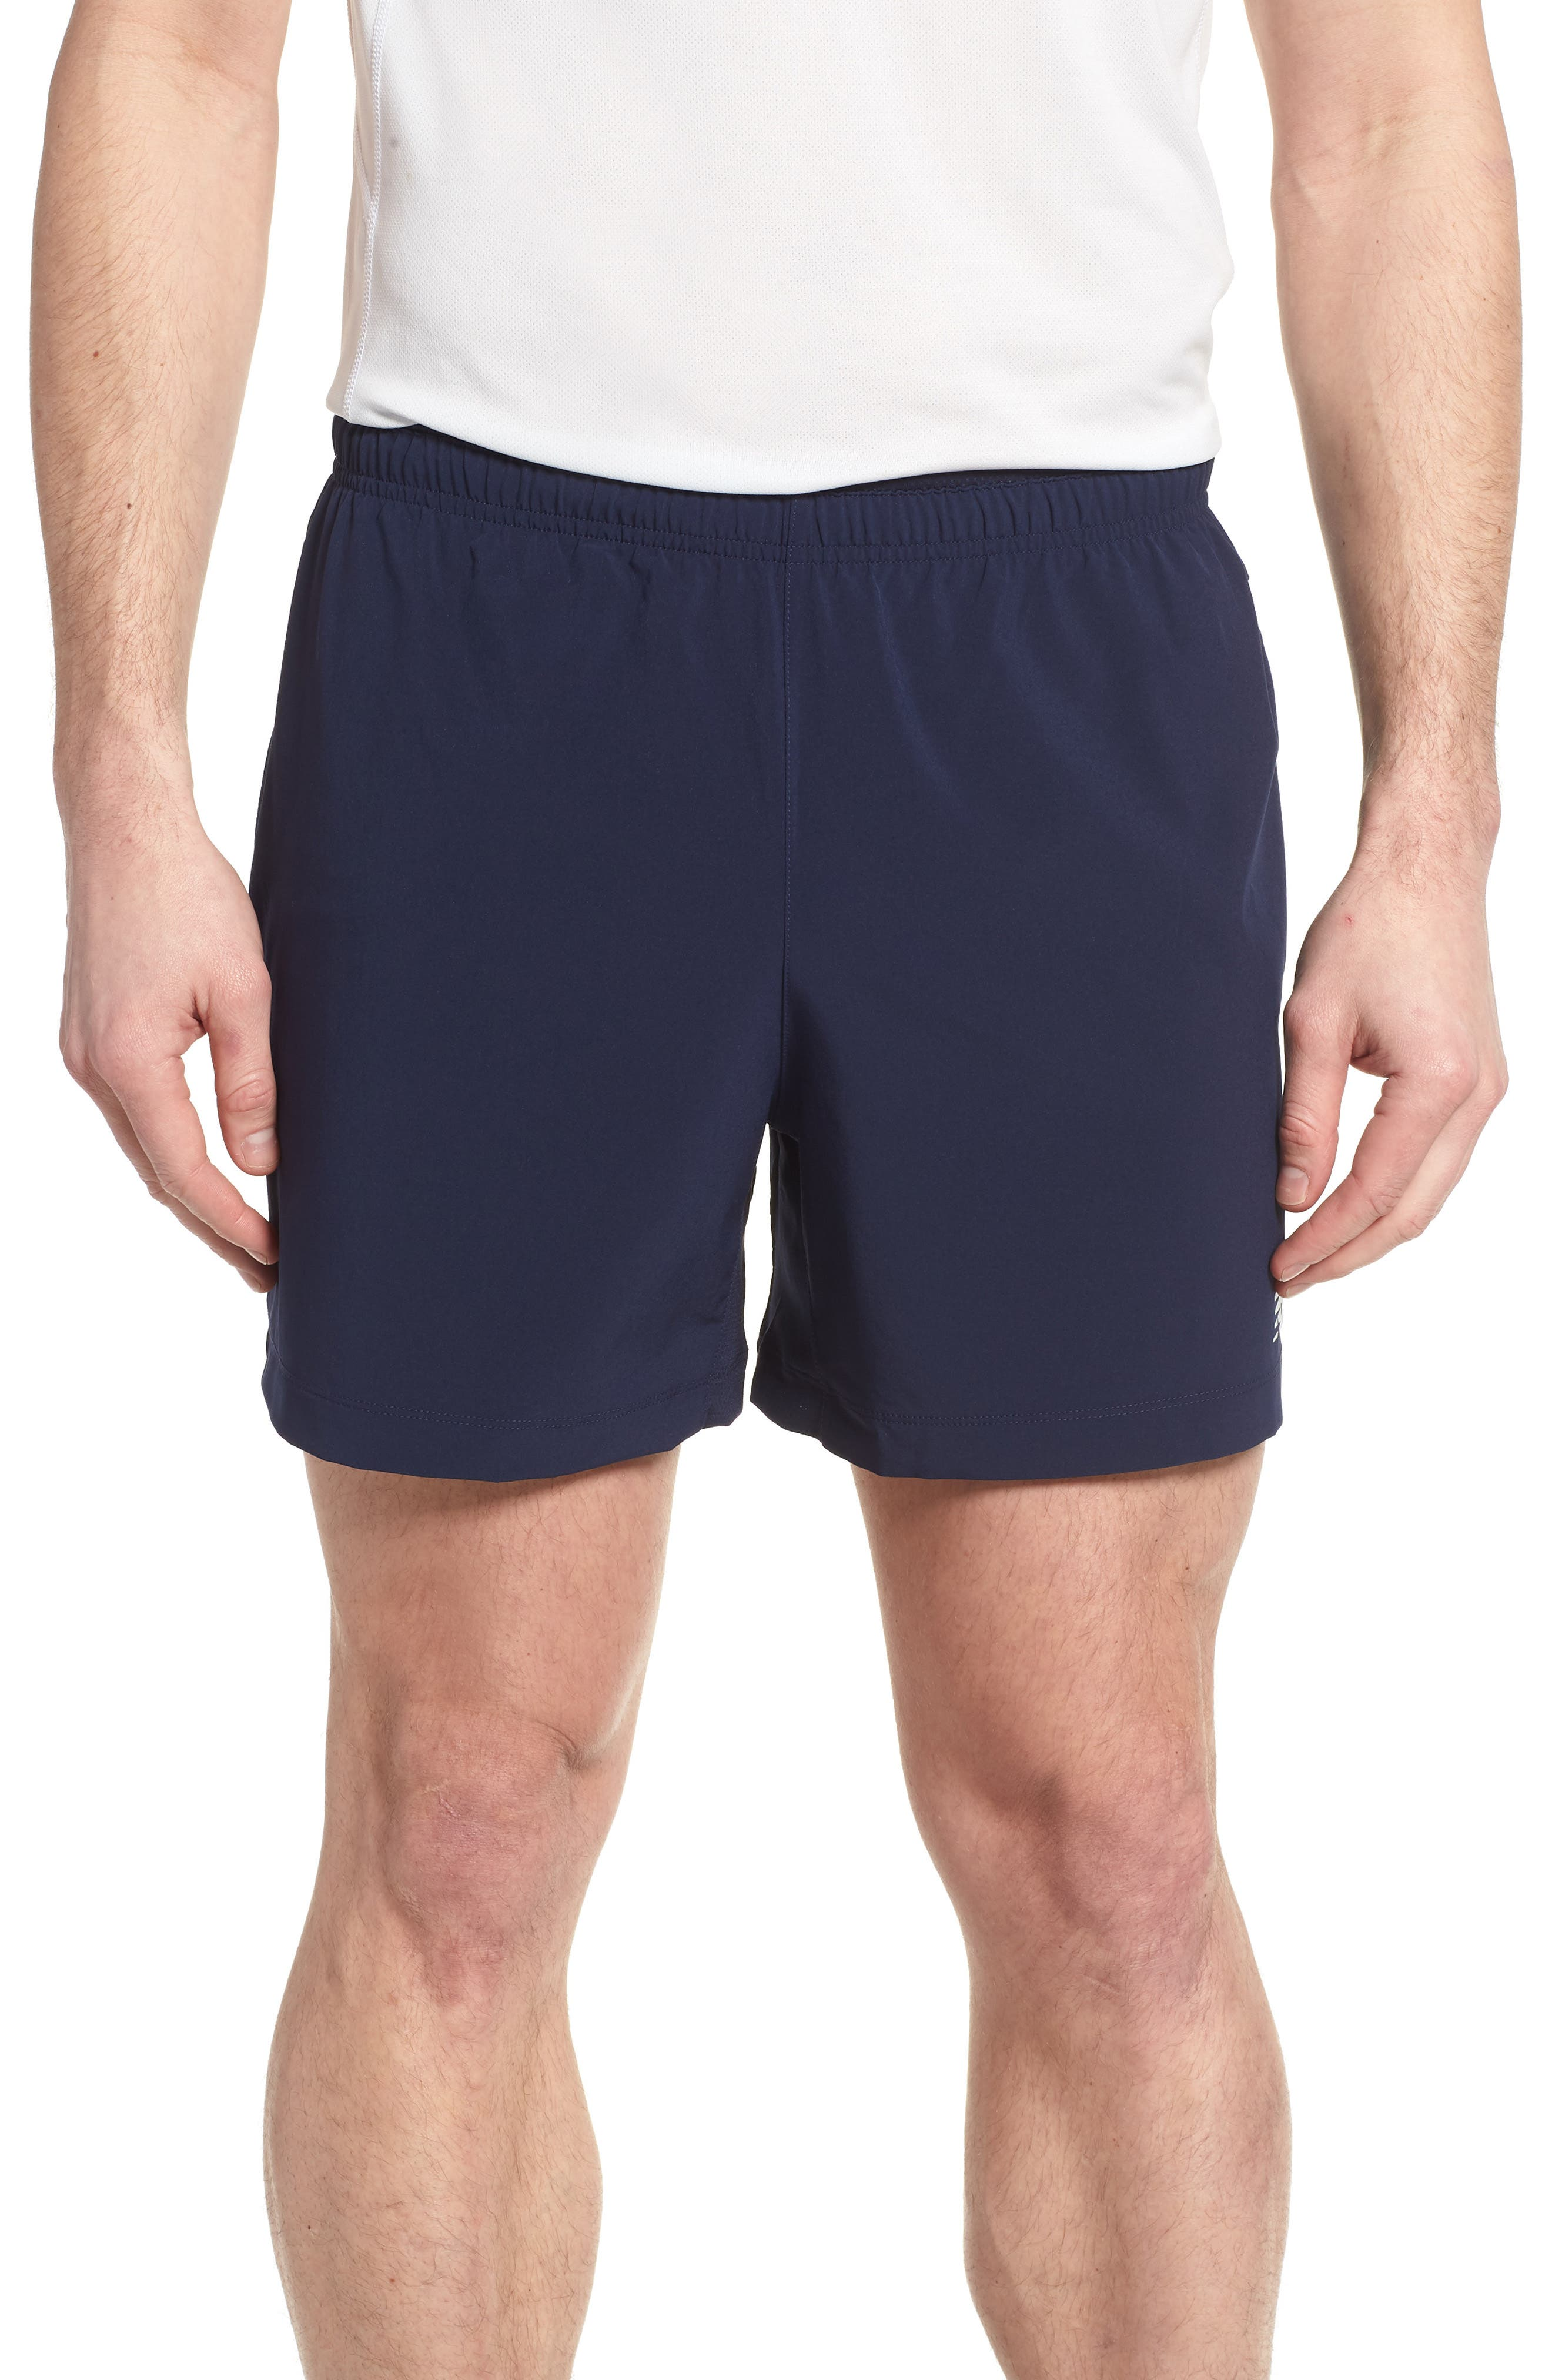 Impact Shorts,                         Main,                         color, Pigment